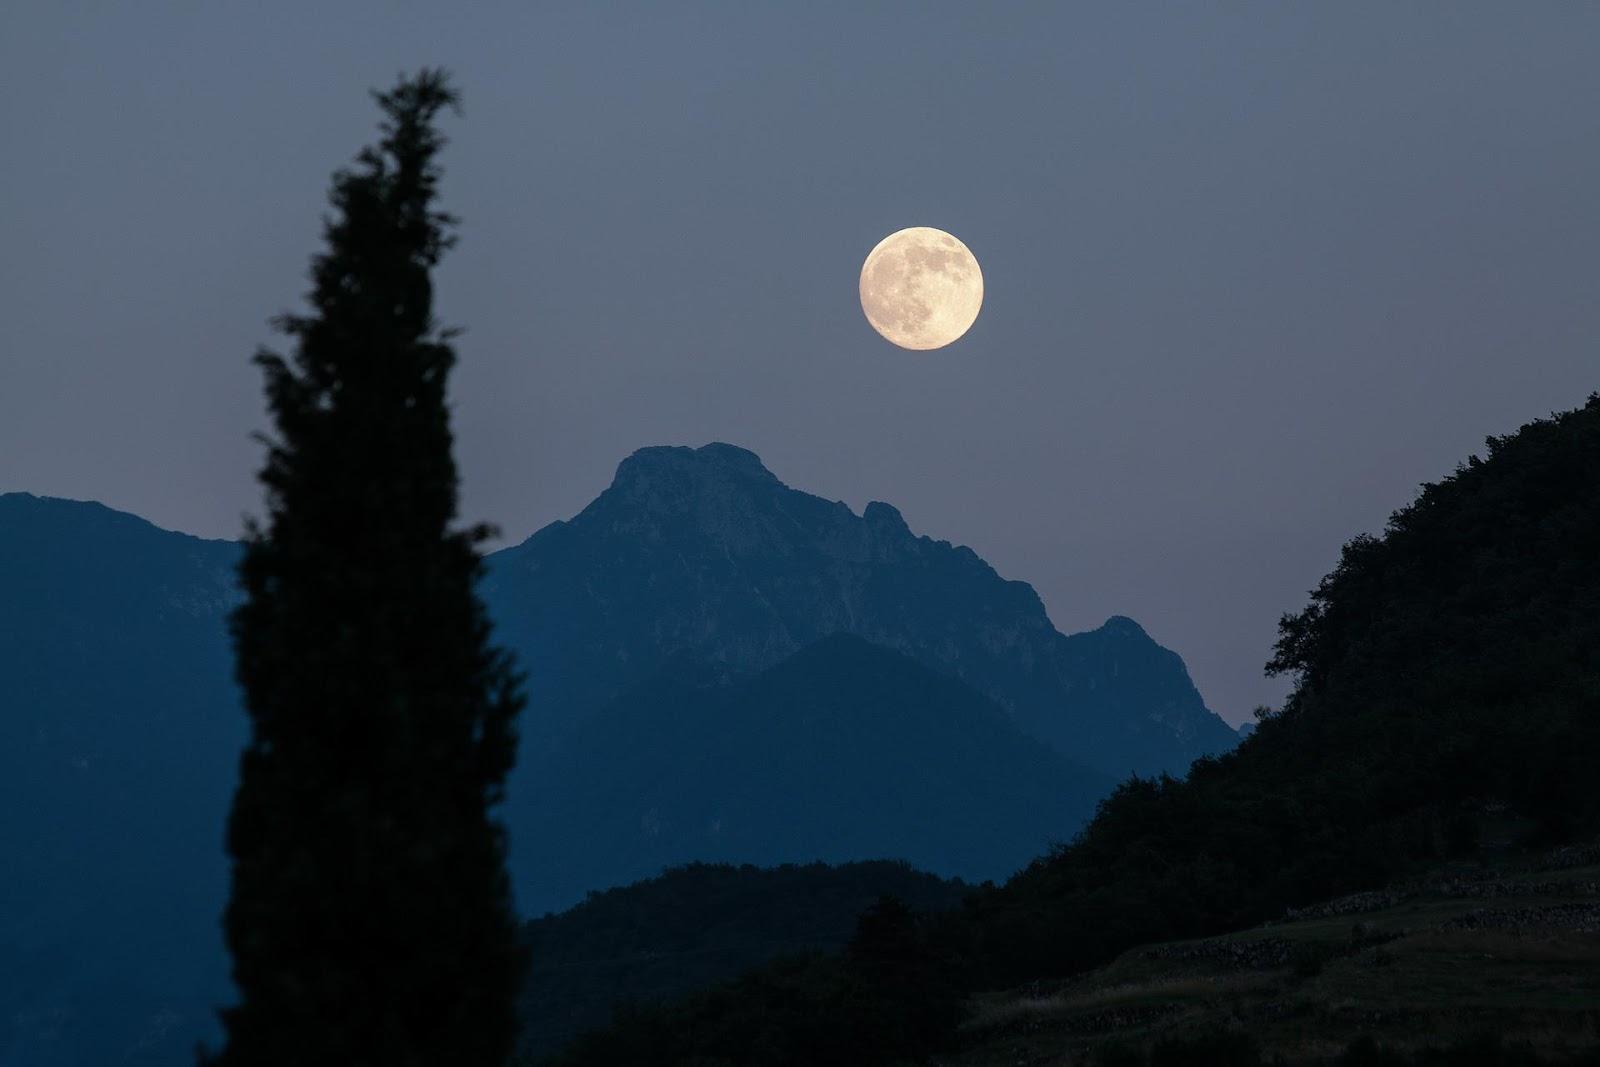 moon against mountain range